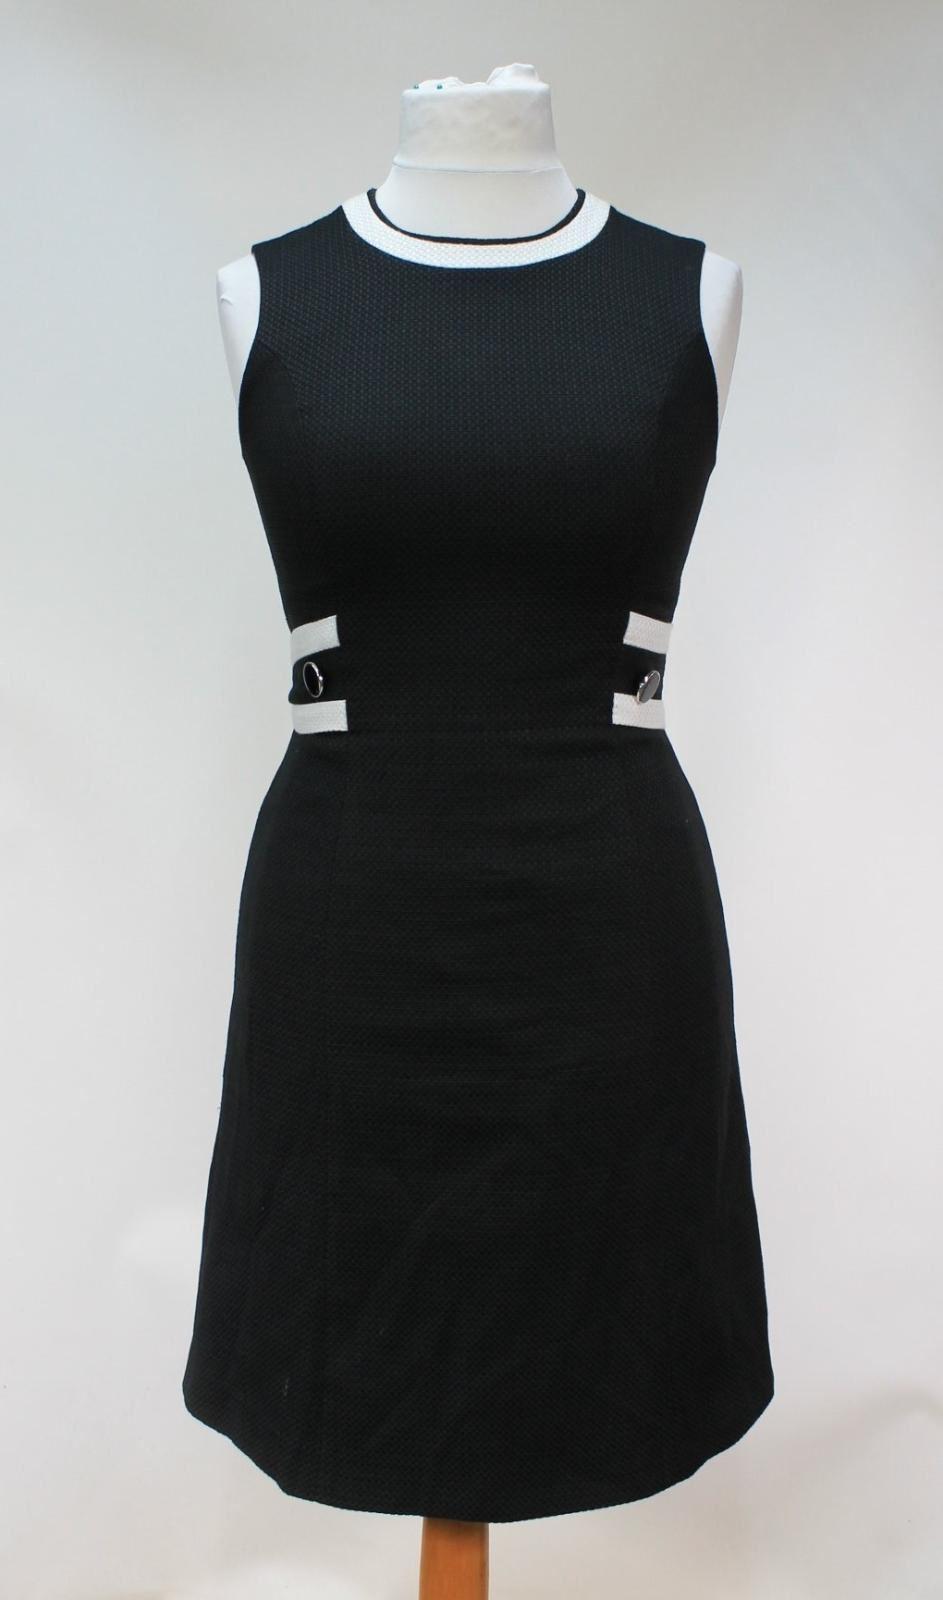 HOBBS-Ladies-Jacquie-Black-Ivory-Cotton-Blend-Round-Neck-Shift-Dress-UK10